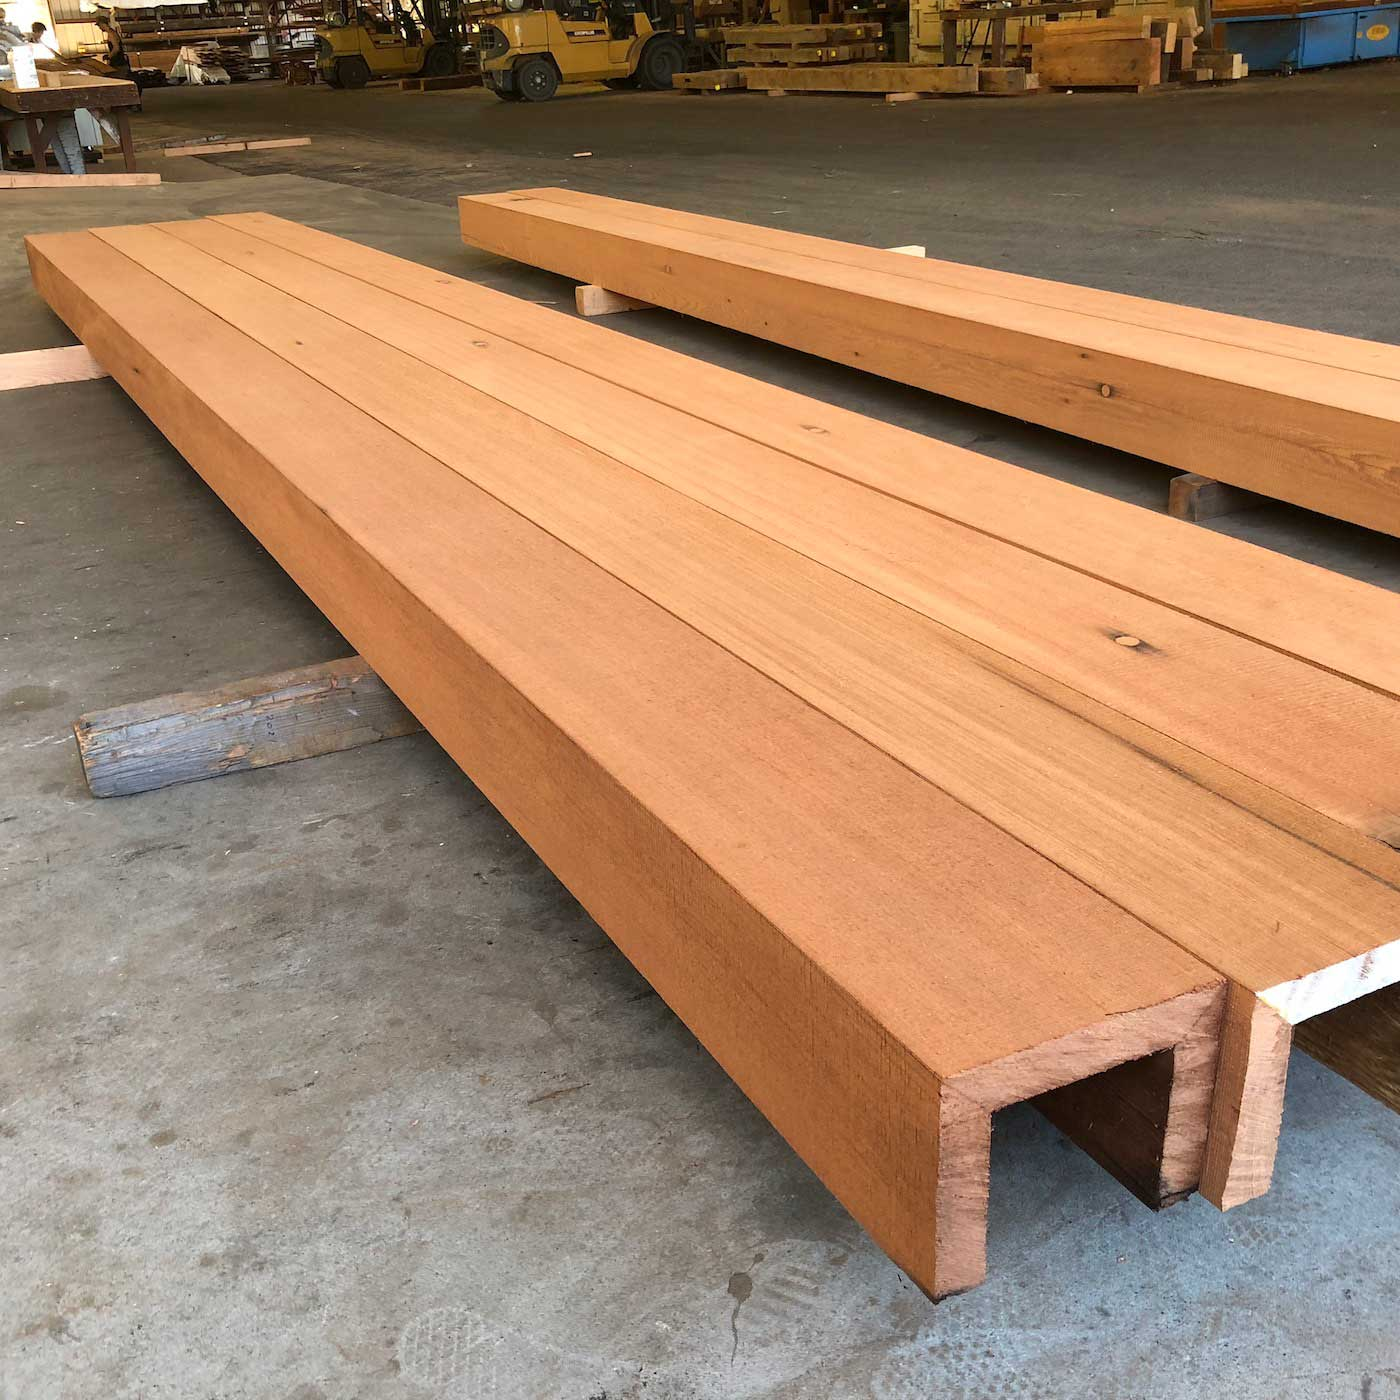 Resawn Redwood Box Beams Detail - Box Beam Fabrication